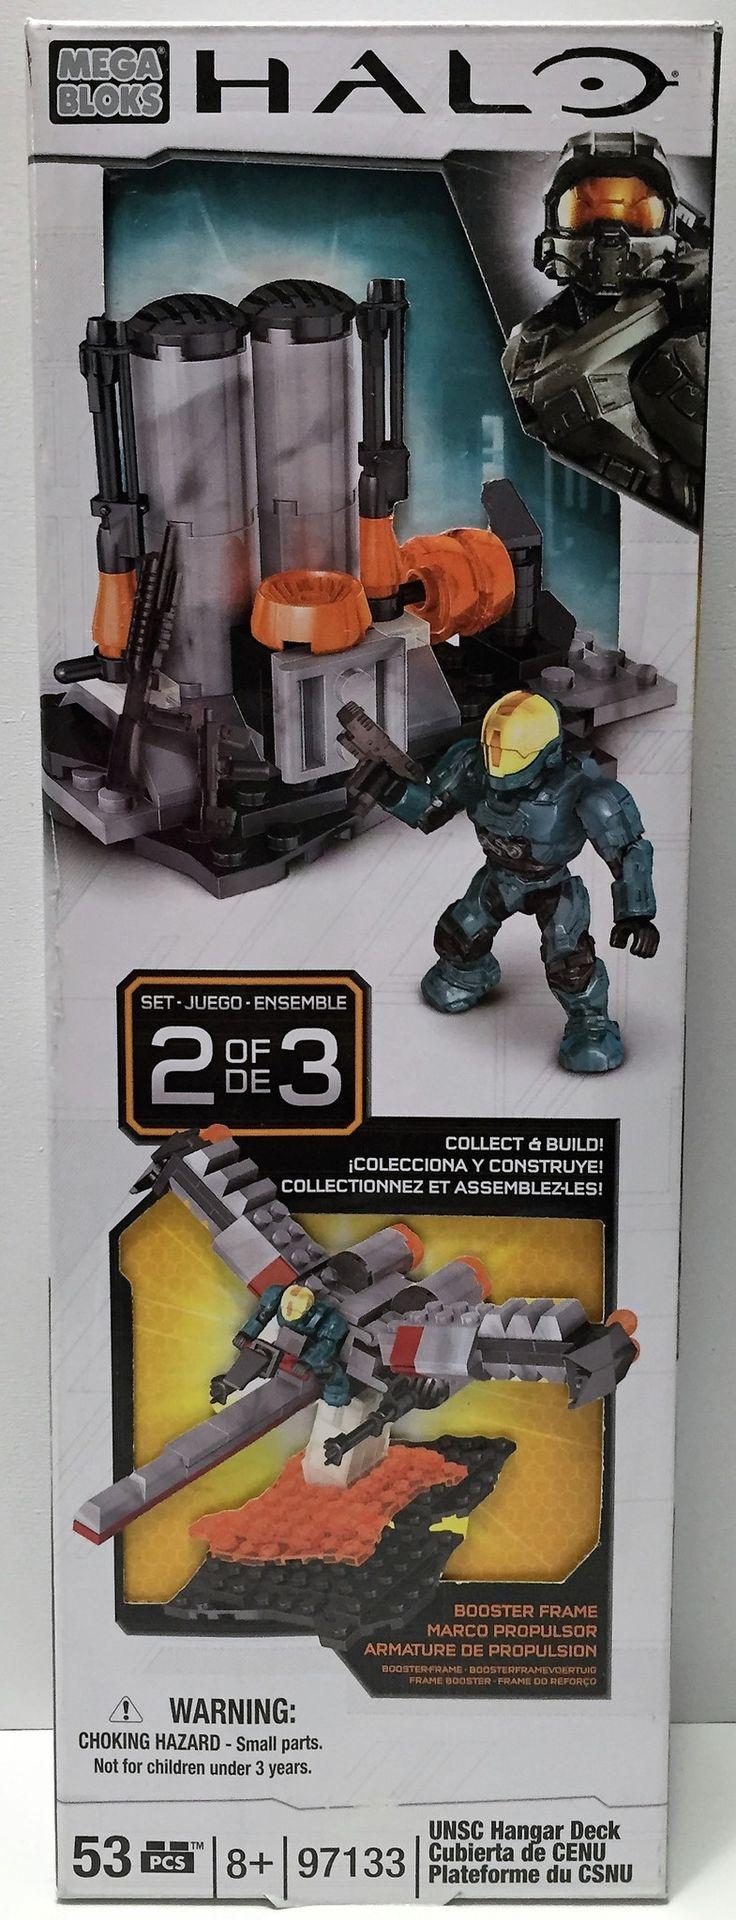 (TAS033752) - 2013 Mega Bloks Collectible Buildable Halo Toyset - Set 2 of 3